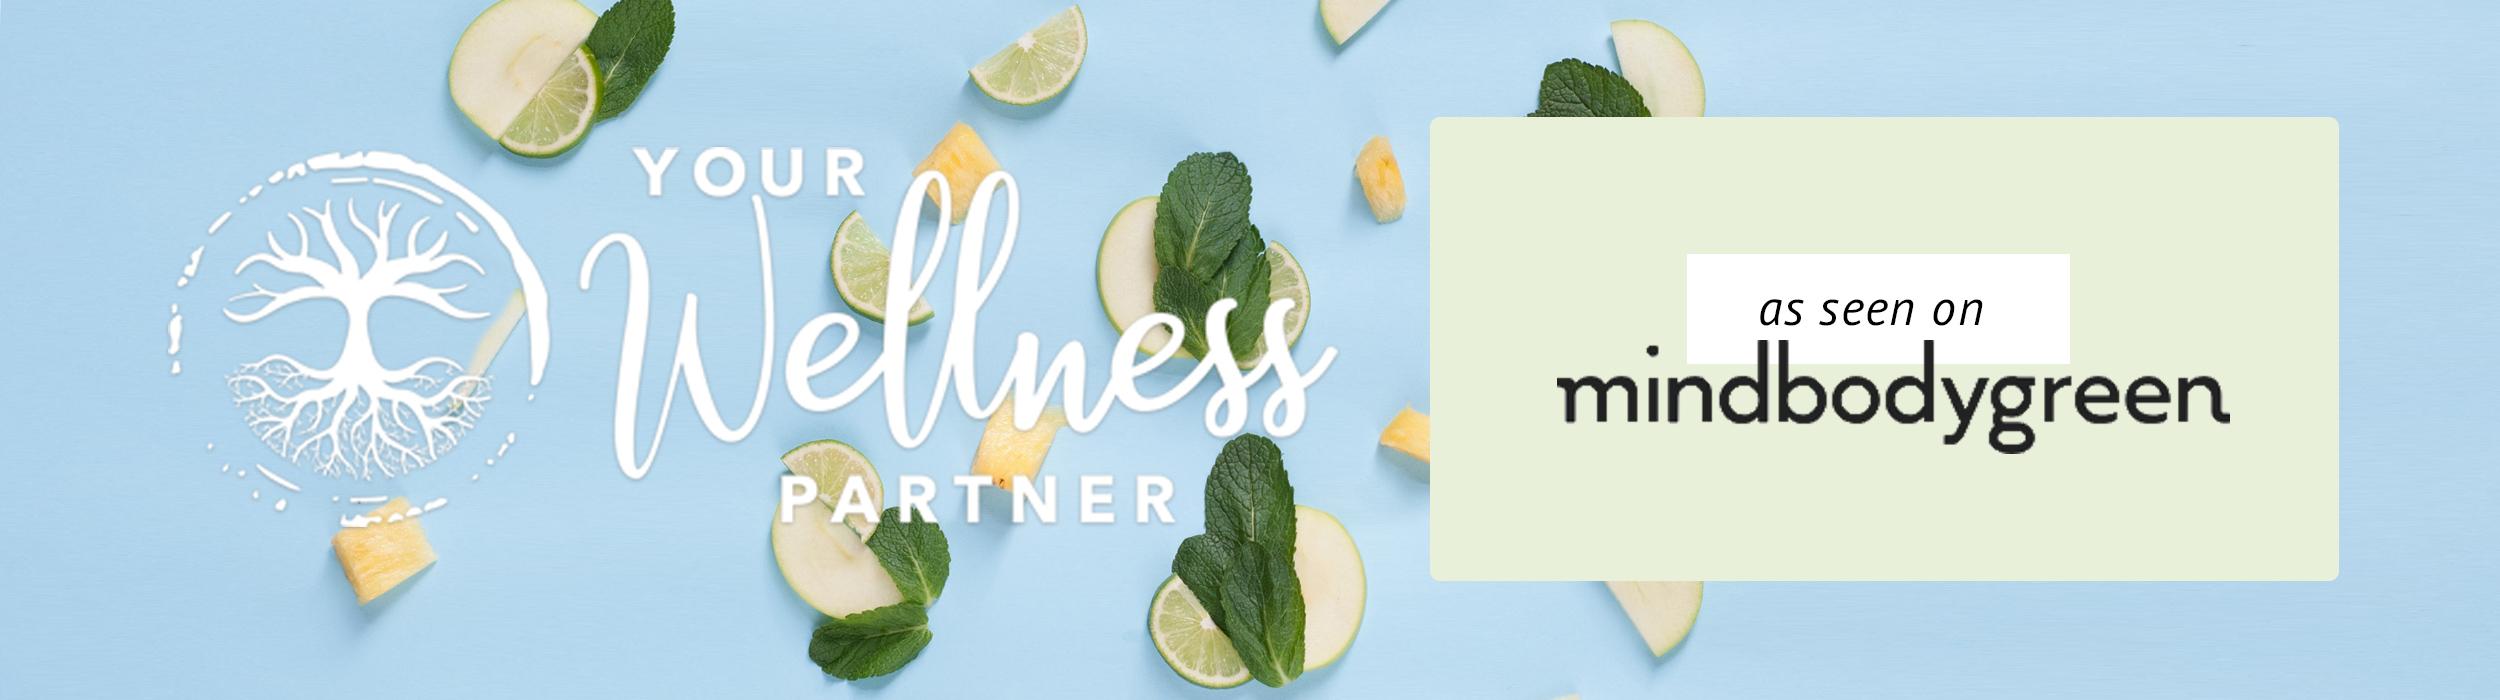 your wellness partner on mindbodygreen